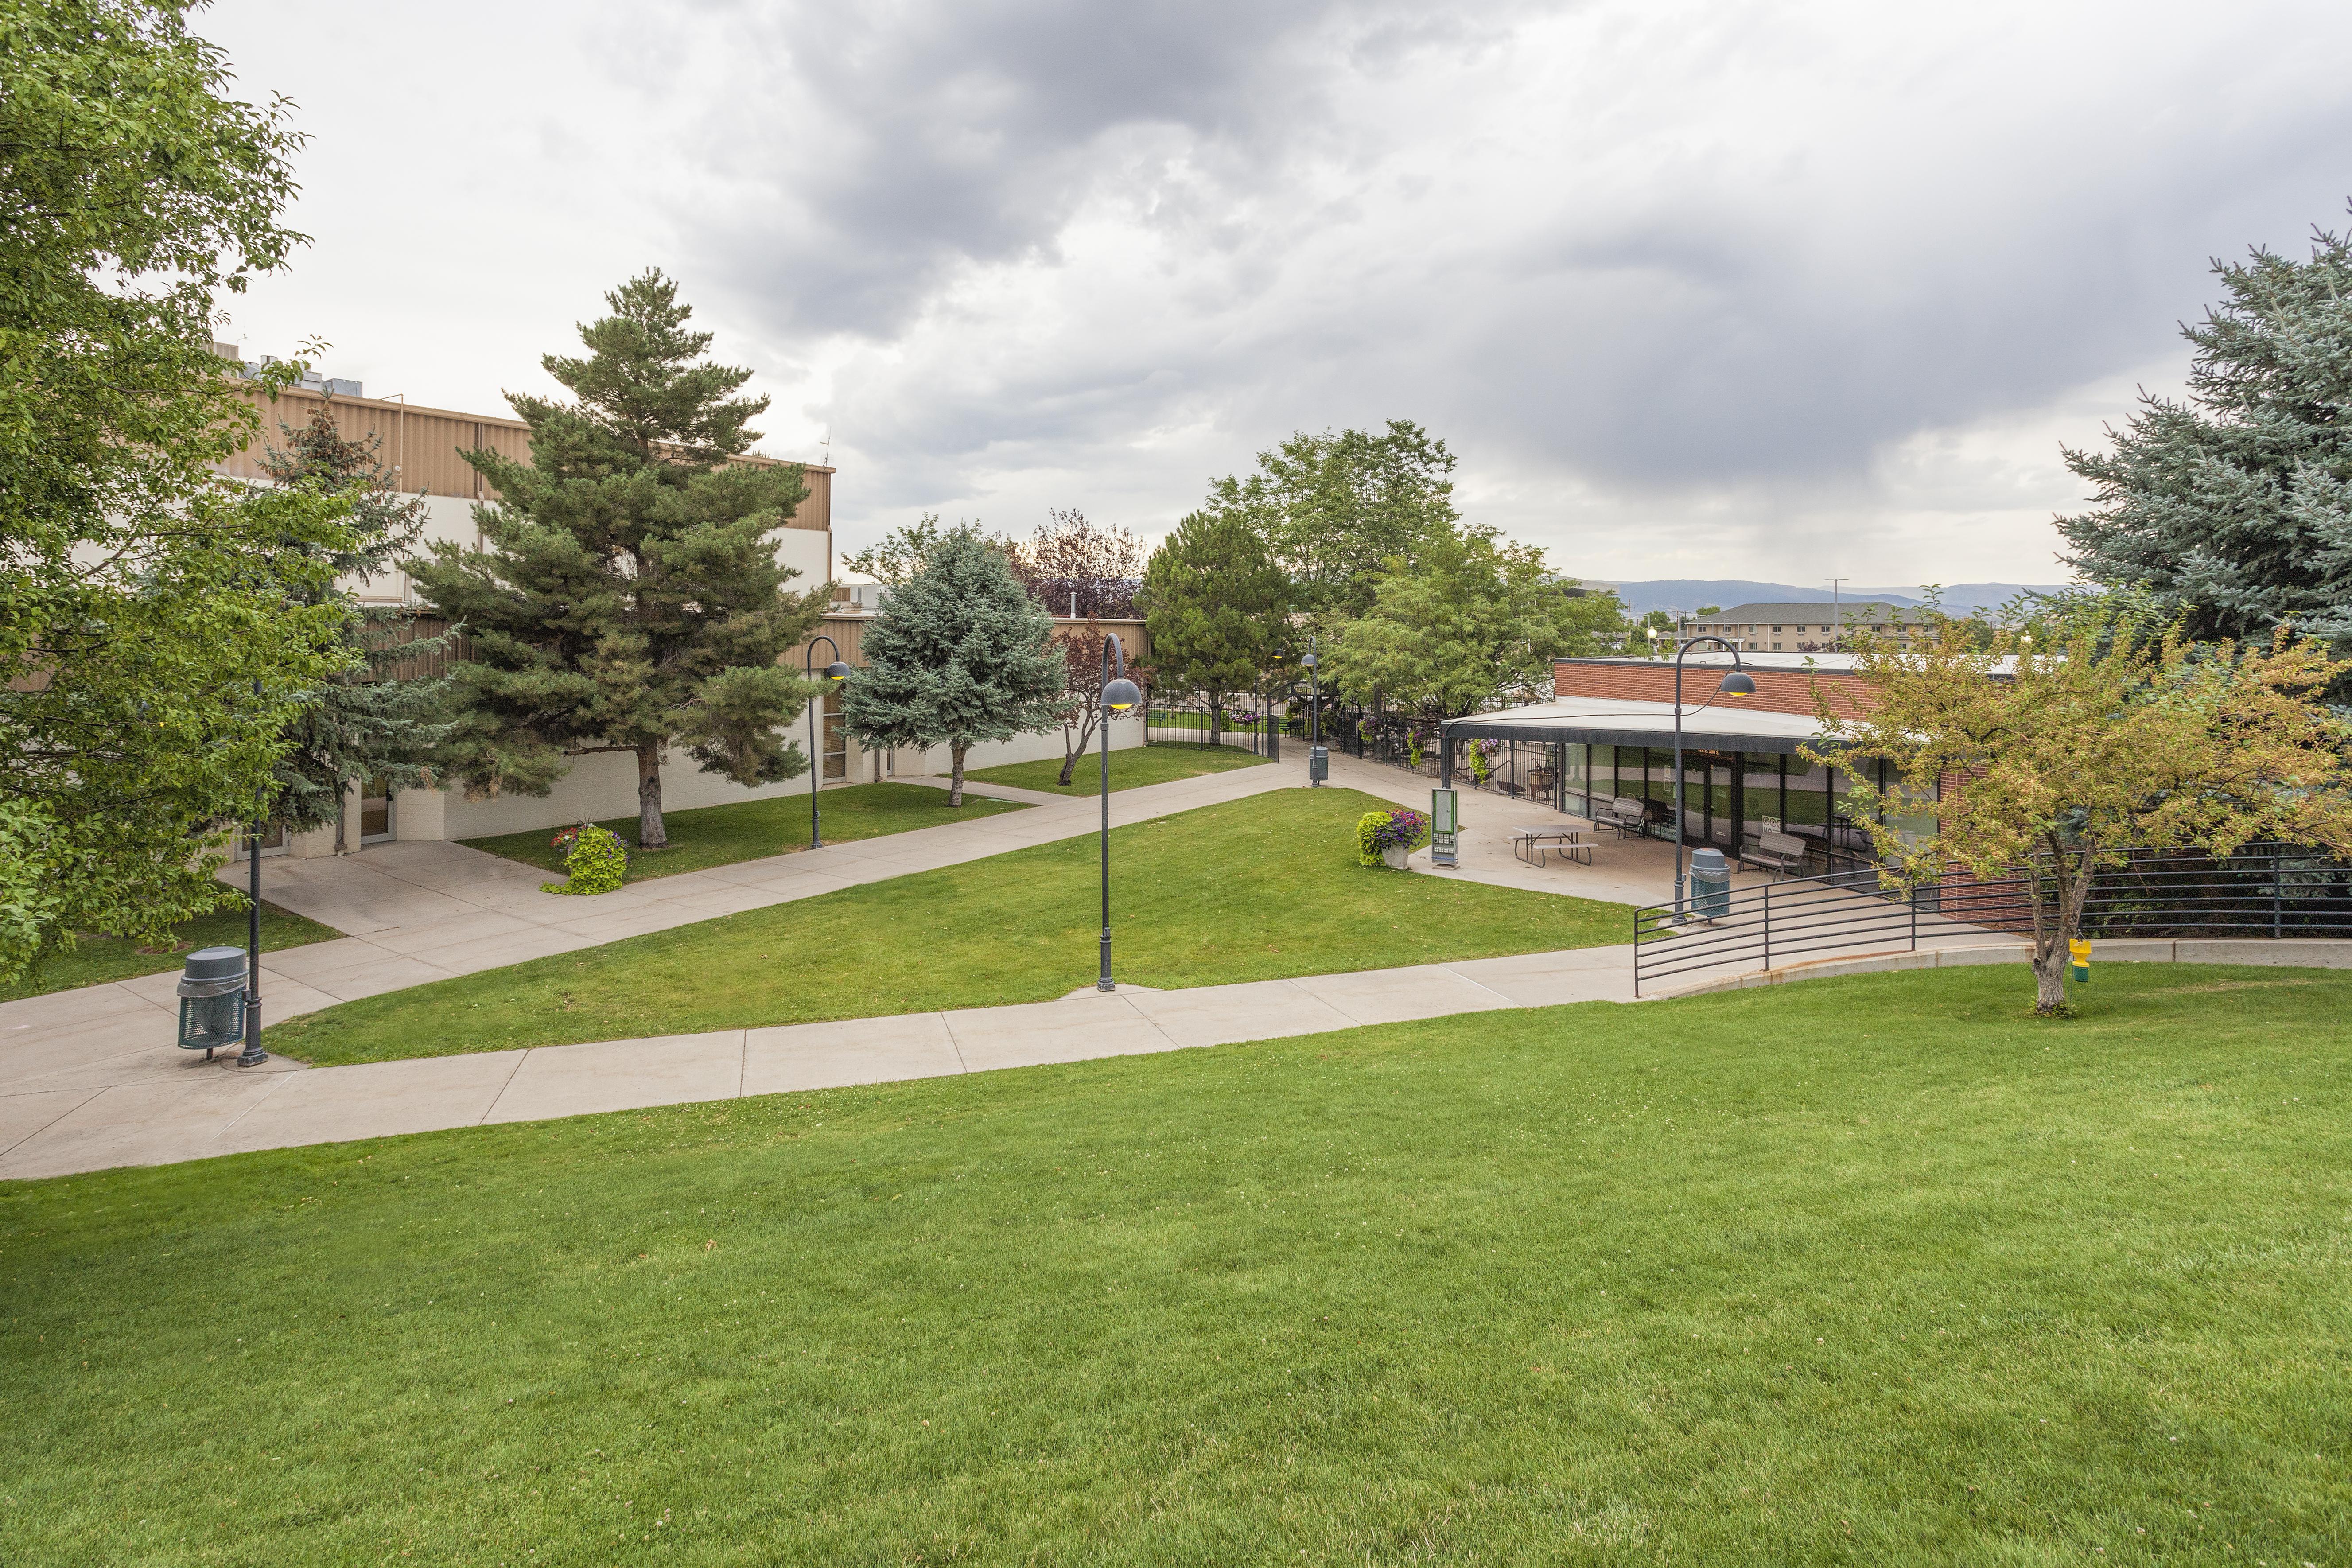 Western Park Mall Area